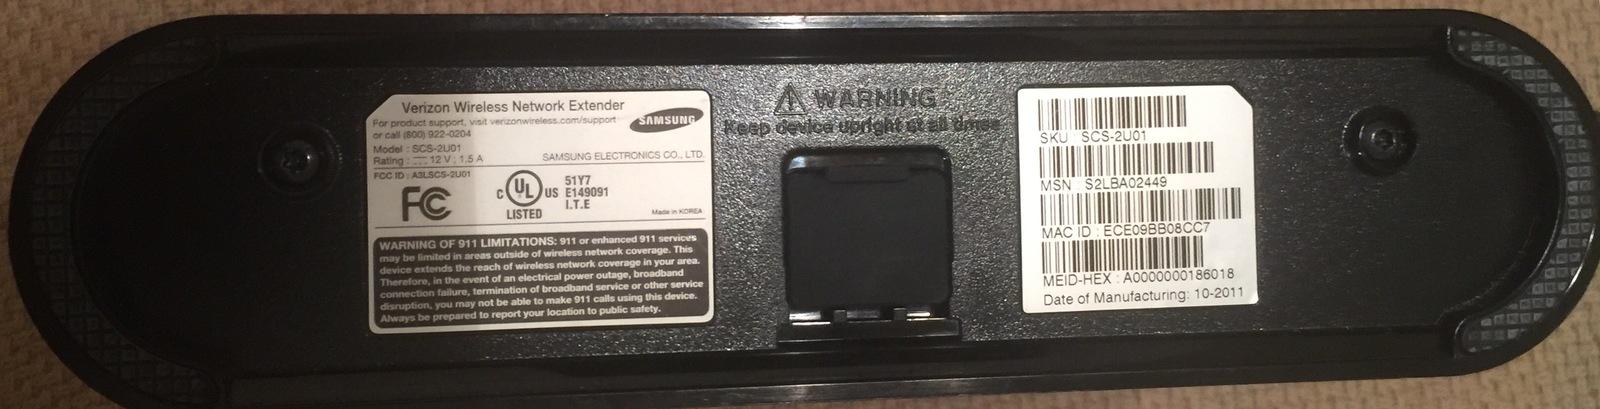 Samsung SCS-2U01 3G Verizon Wireless Network and 50 similar